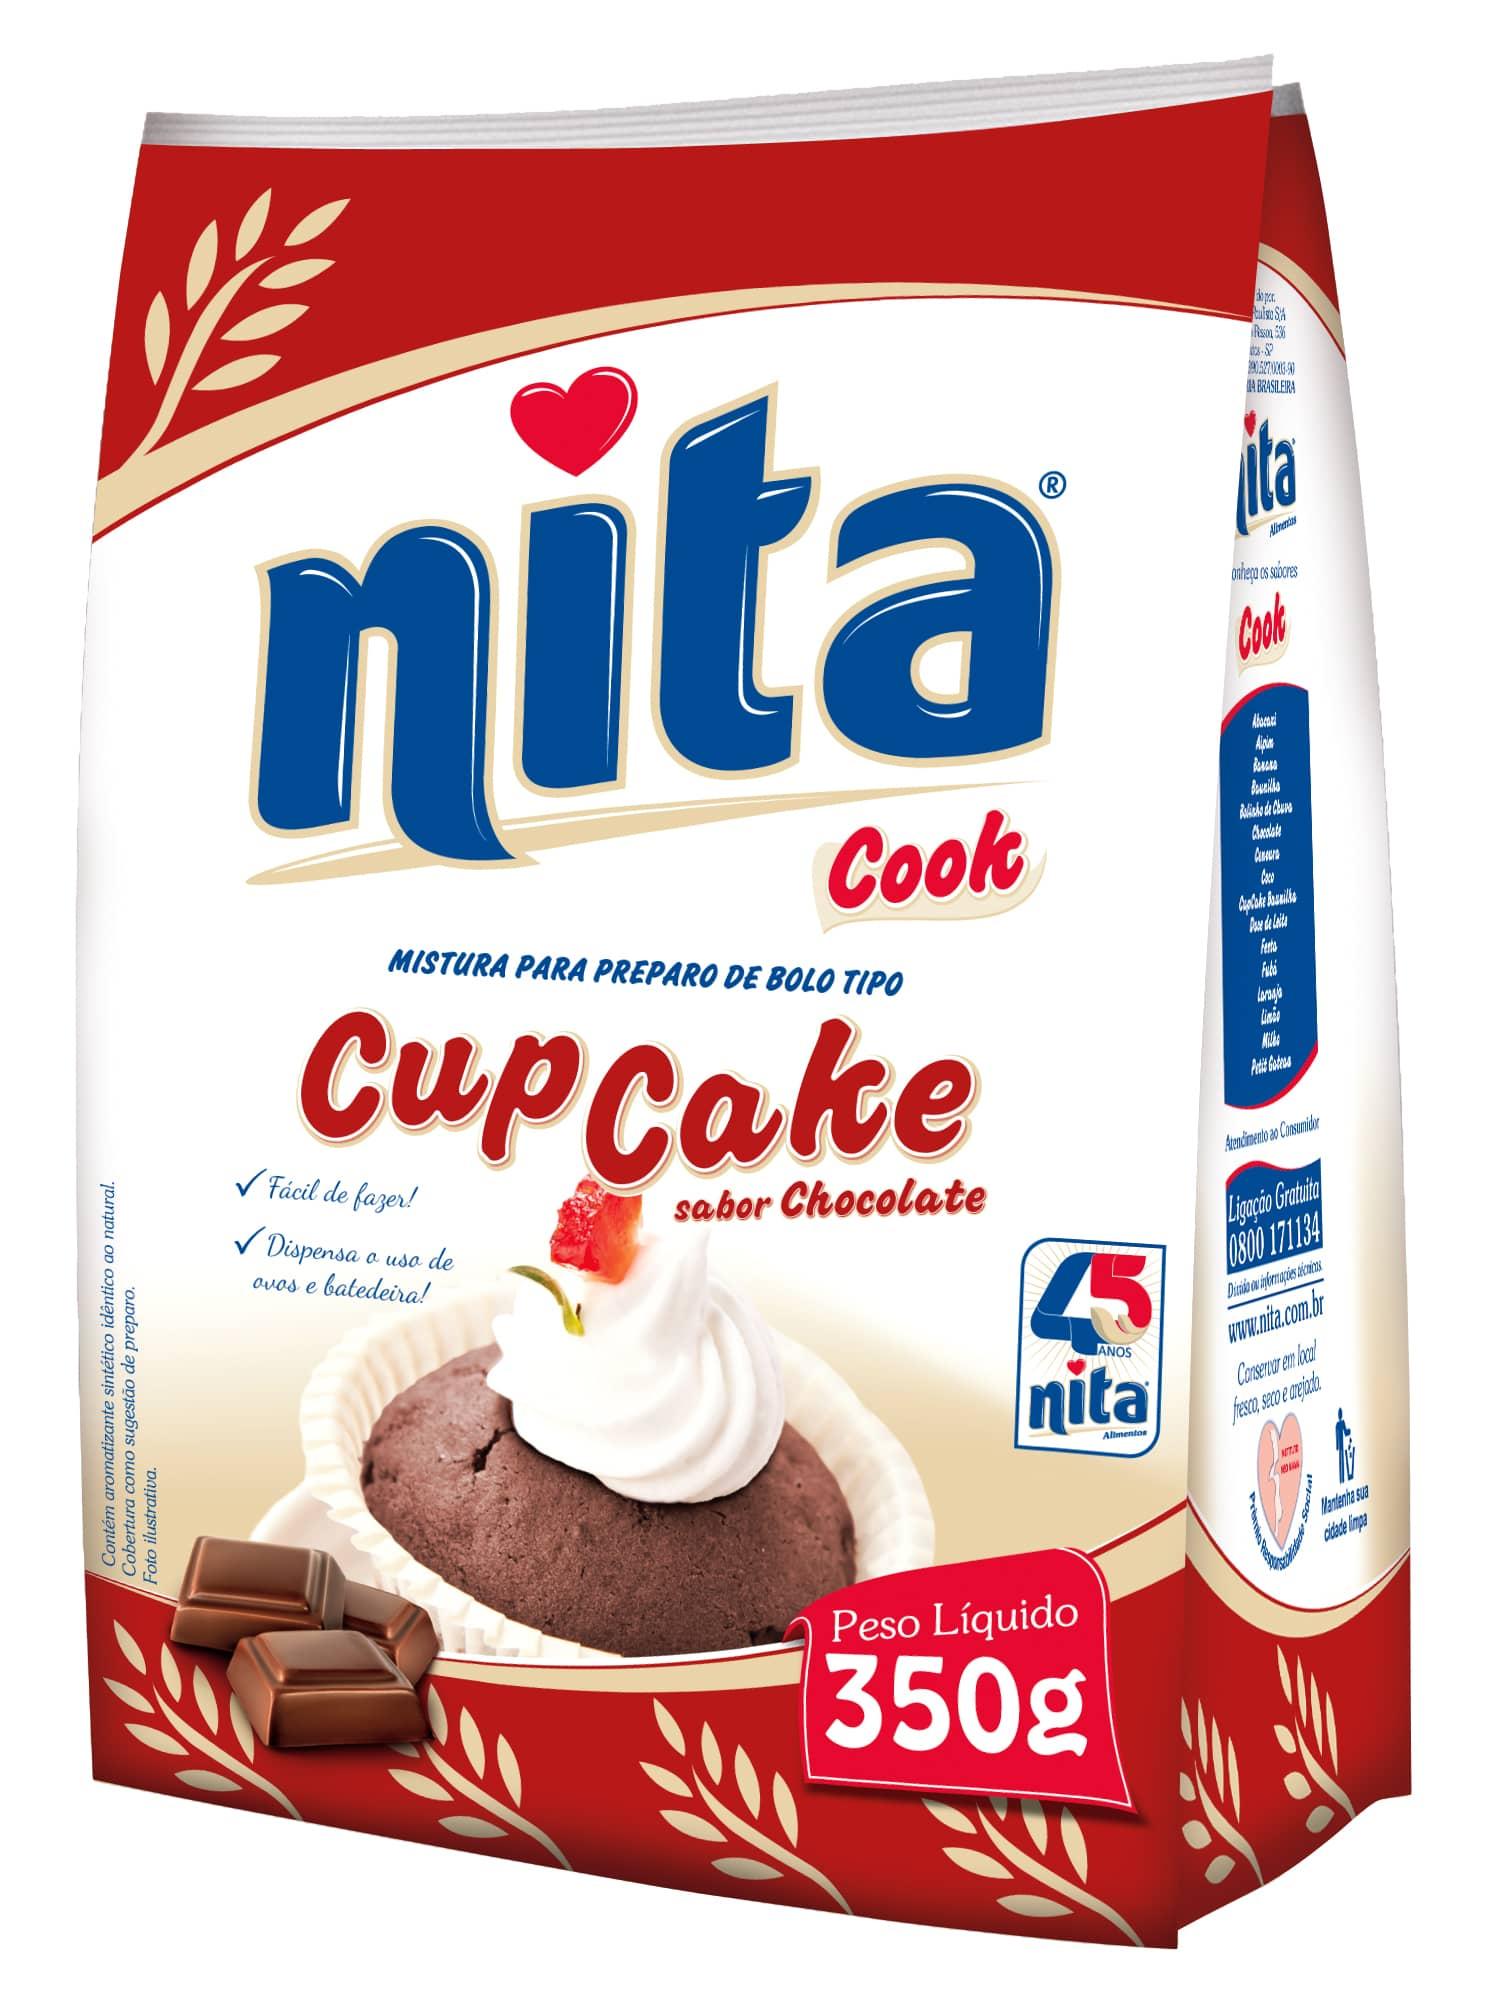 Cupcake-Chocolate